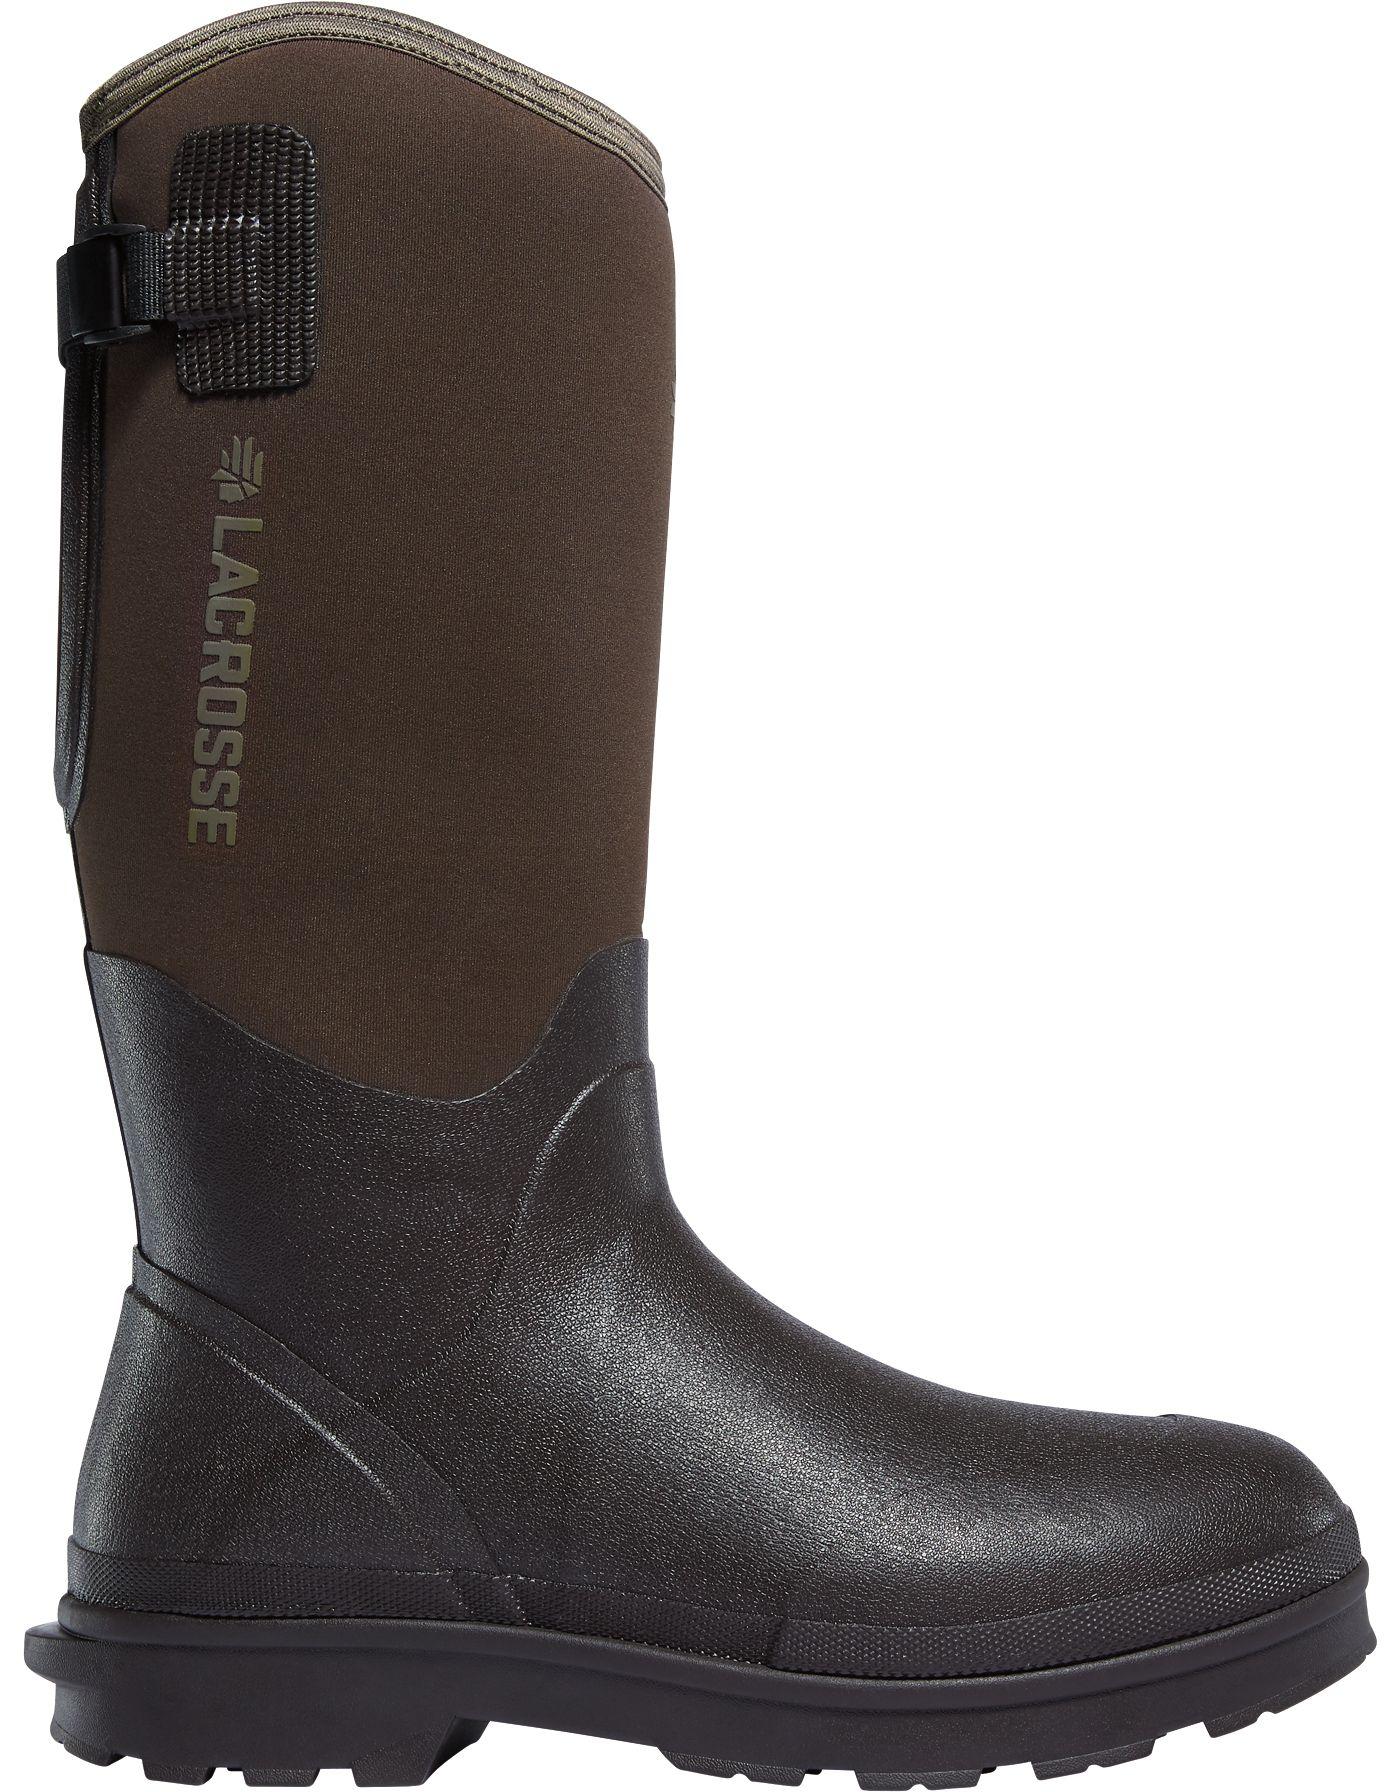 LaCrosse Men's Alpha Range 14'' 5.0mm Rubber Work Boots